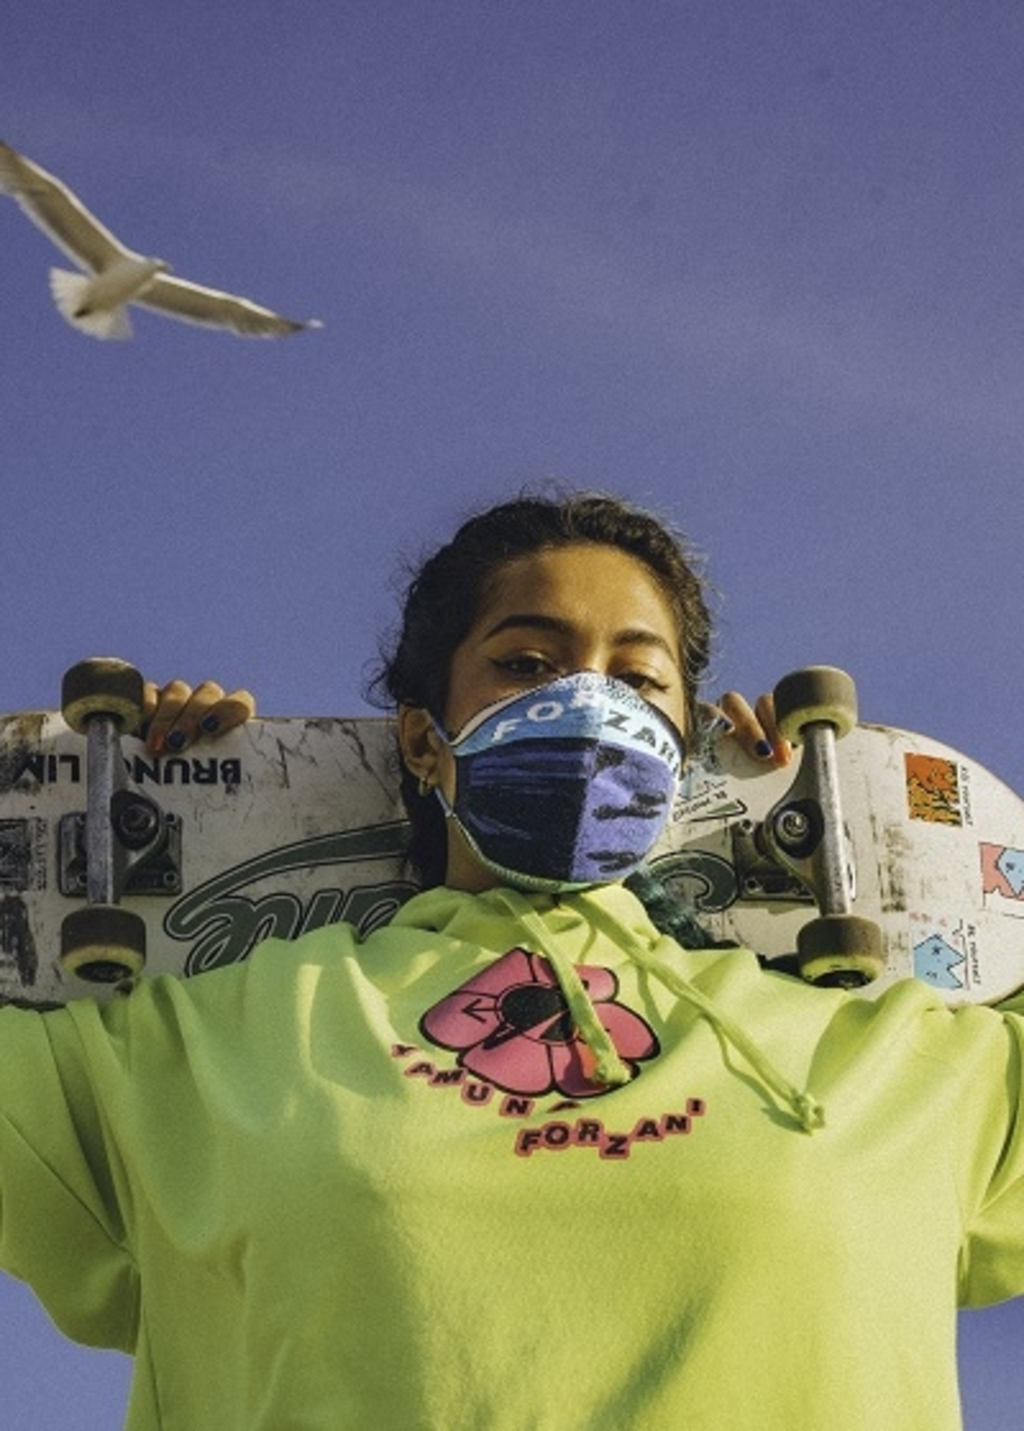 Designer masks by Yamuna Forzani x TextielMuseum, 2020. Foto: Sydney Rahimtoola © DPG Media